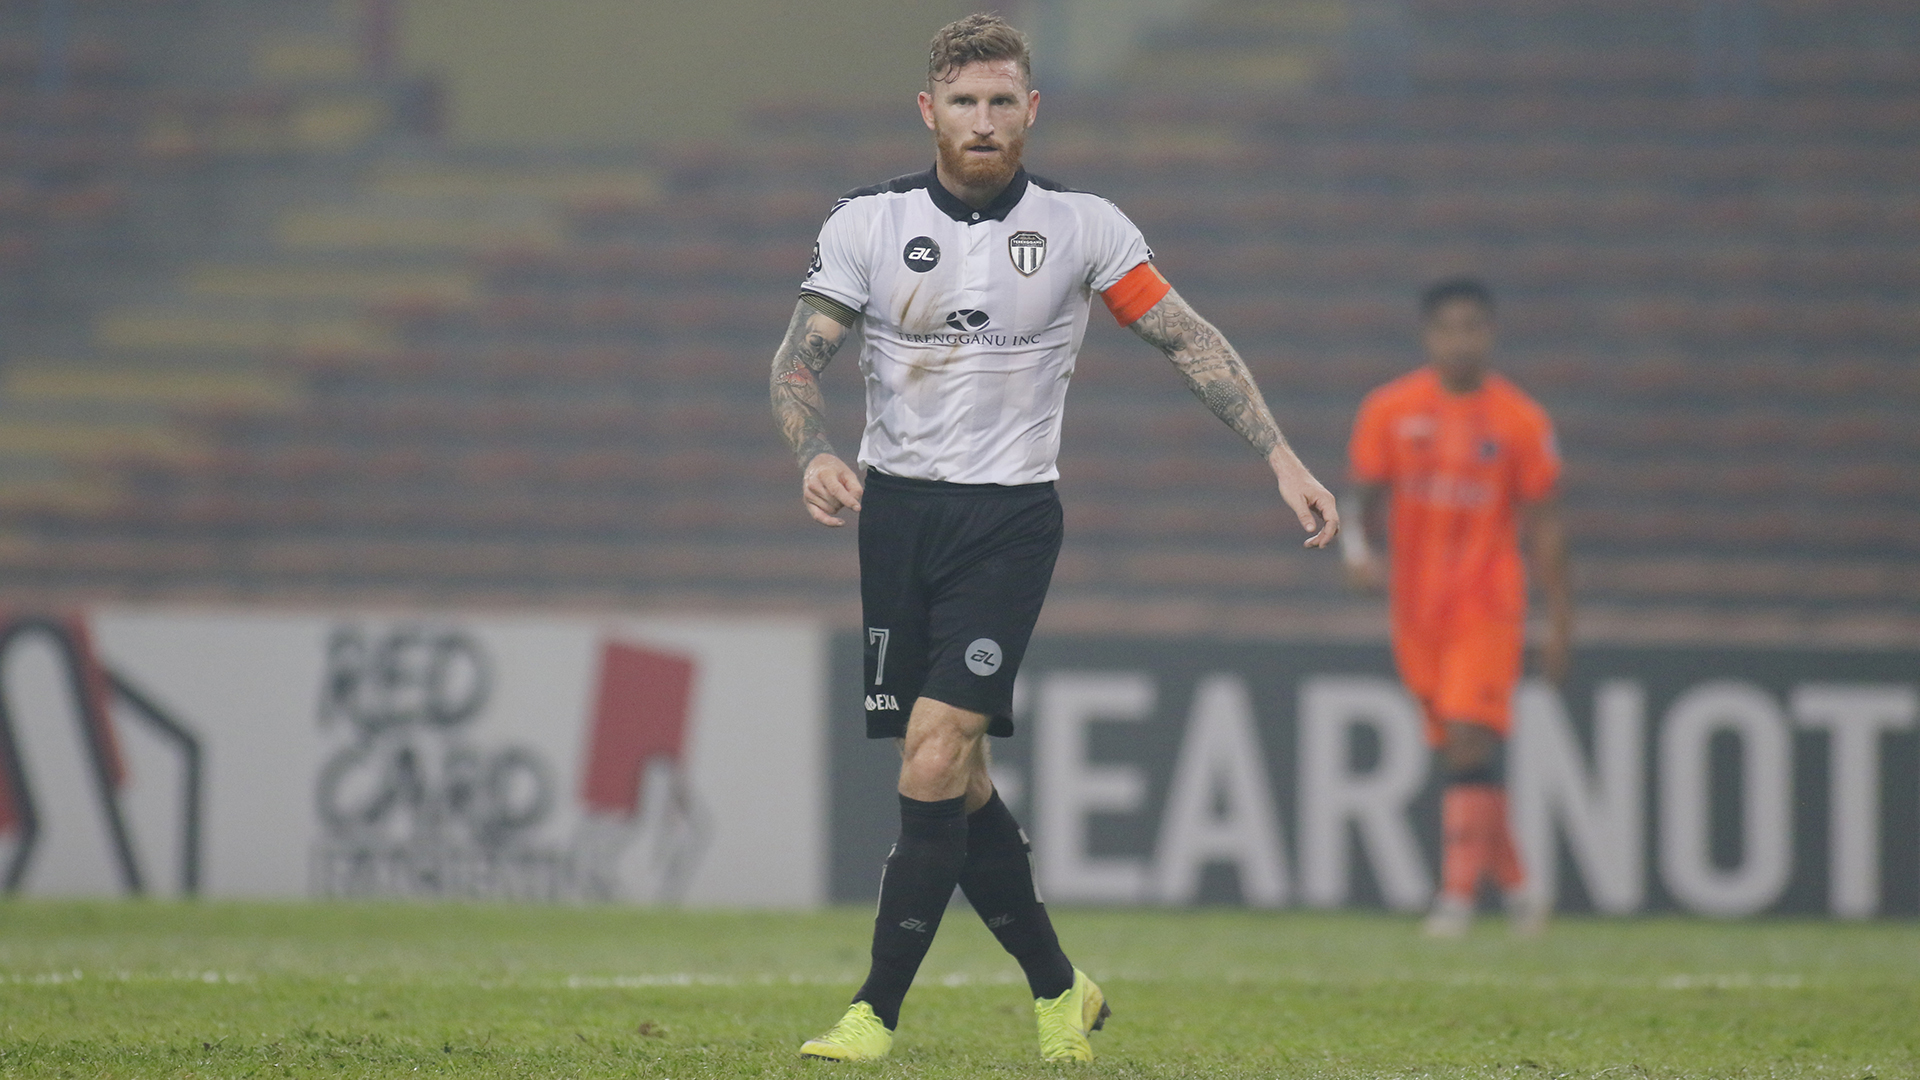 Lee Tuck, PKNS FC v Terengganu FC, Malaysia Cup, 17 Sep 2019